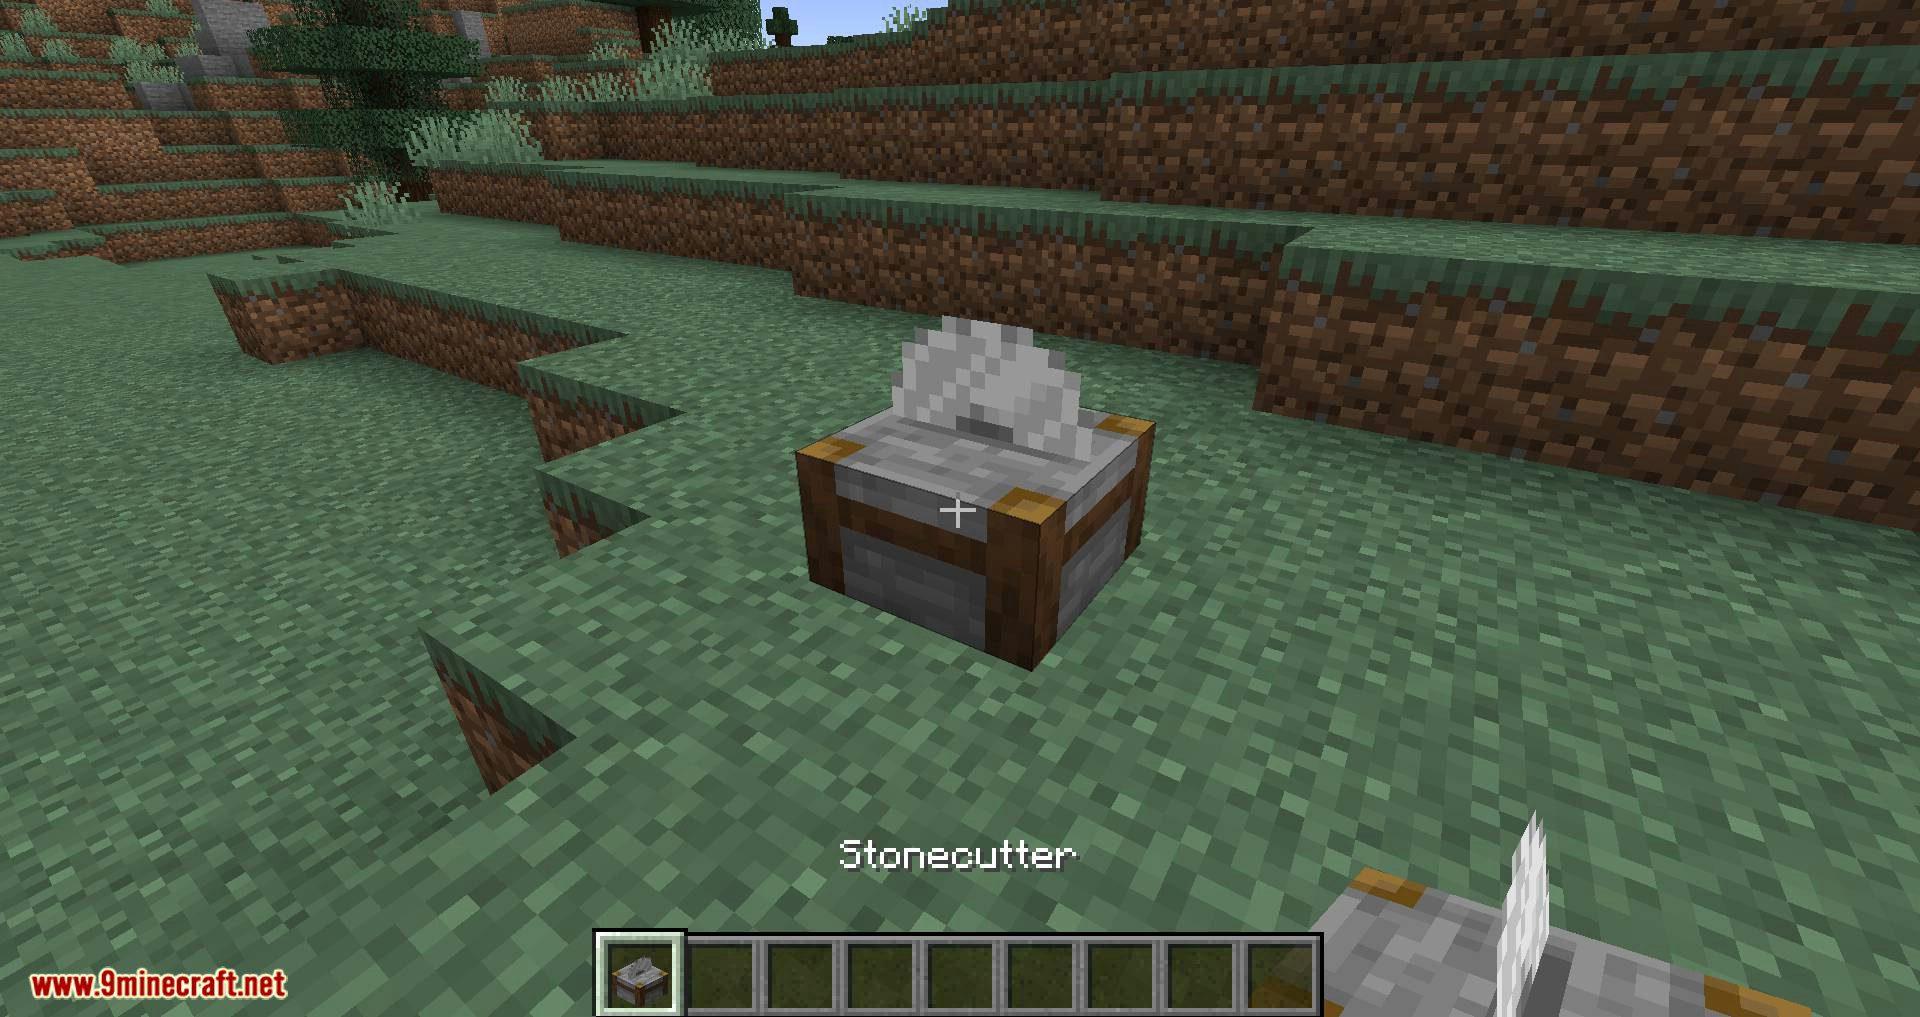 Dangerous Stone Cutter mod for minecraft 01